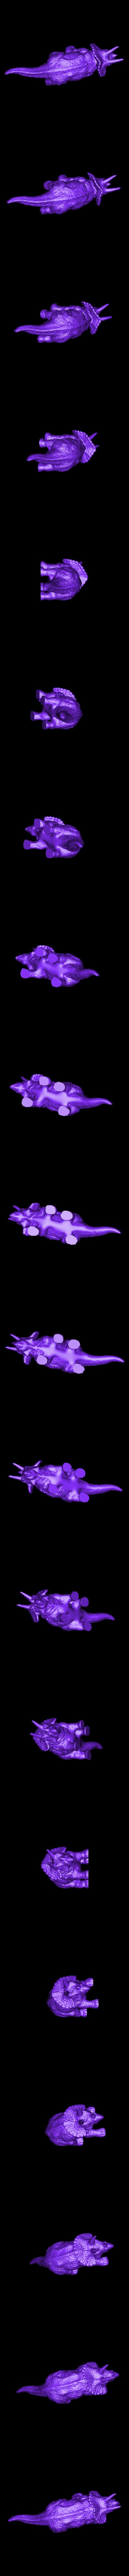 triceratops.stl Download free STL file Triceratops • 3D printable design, itech3dp